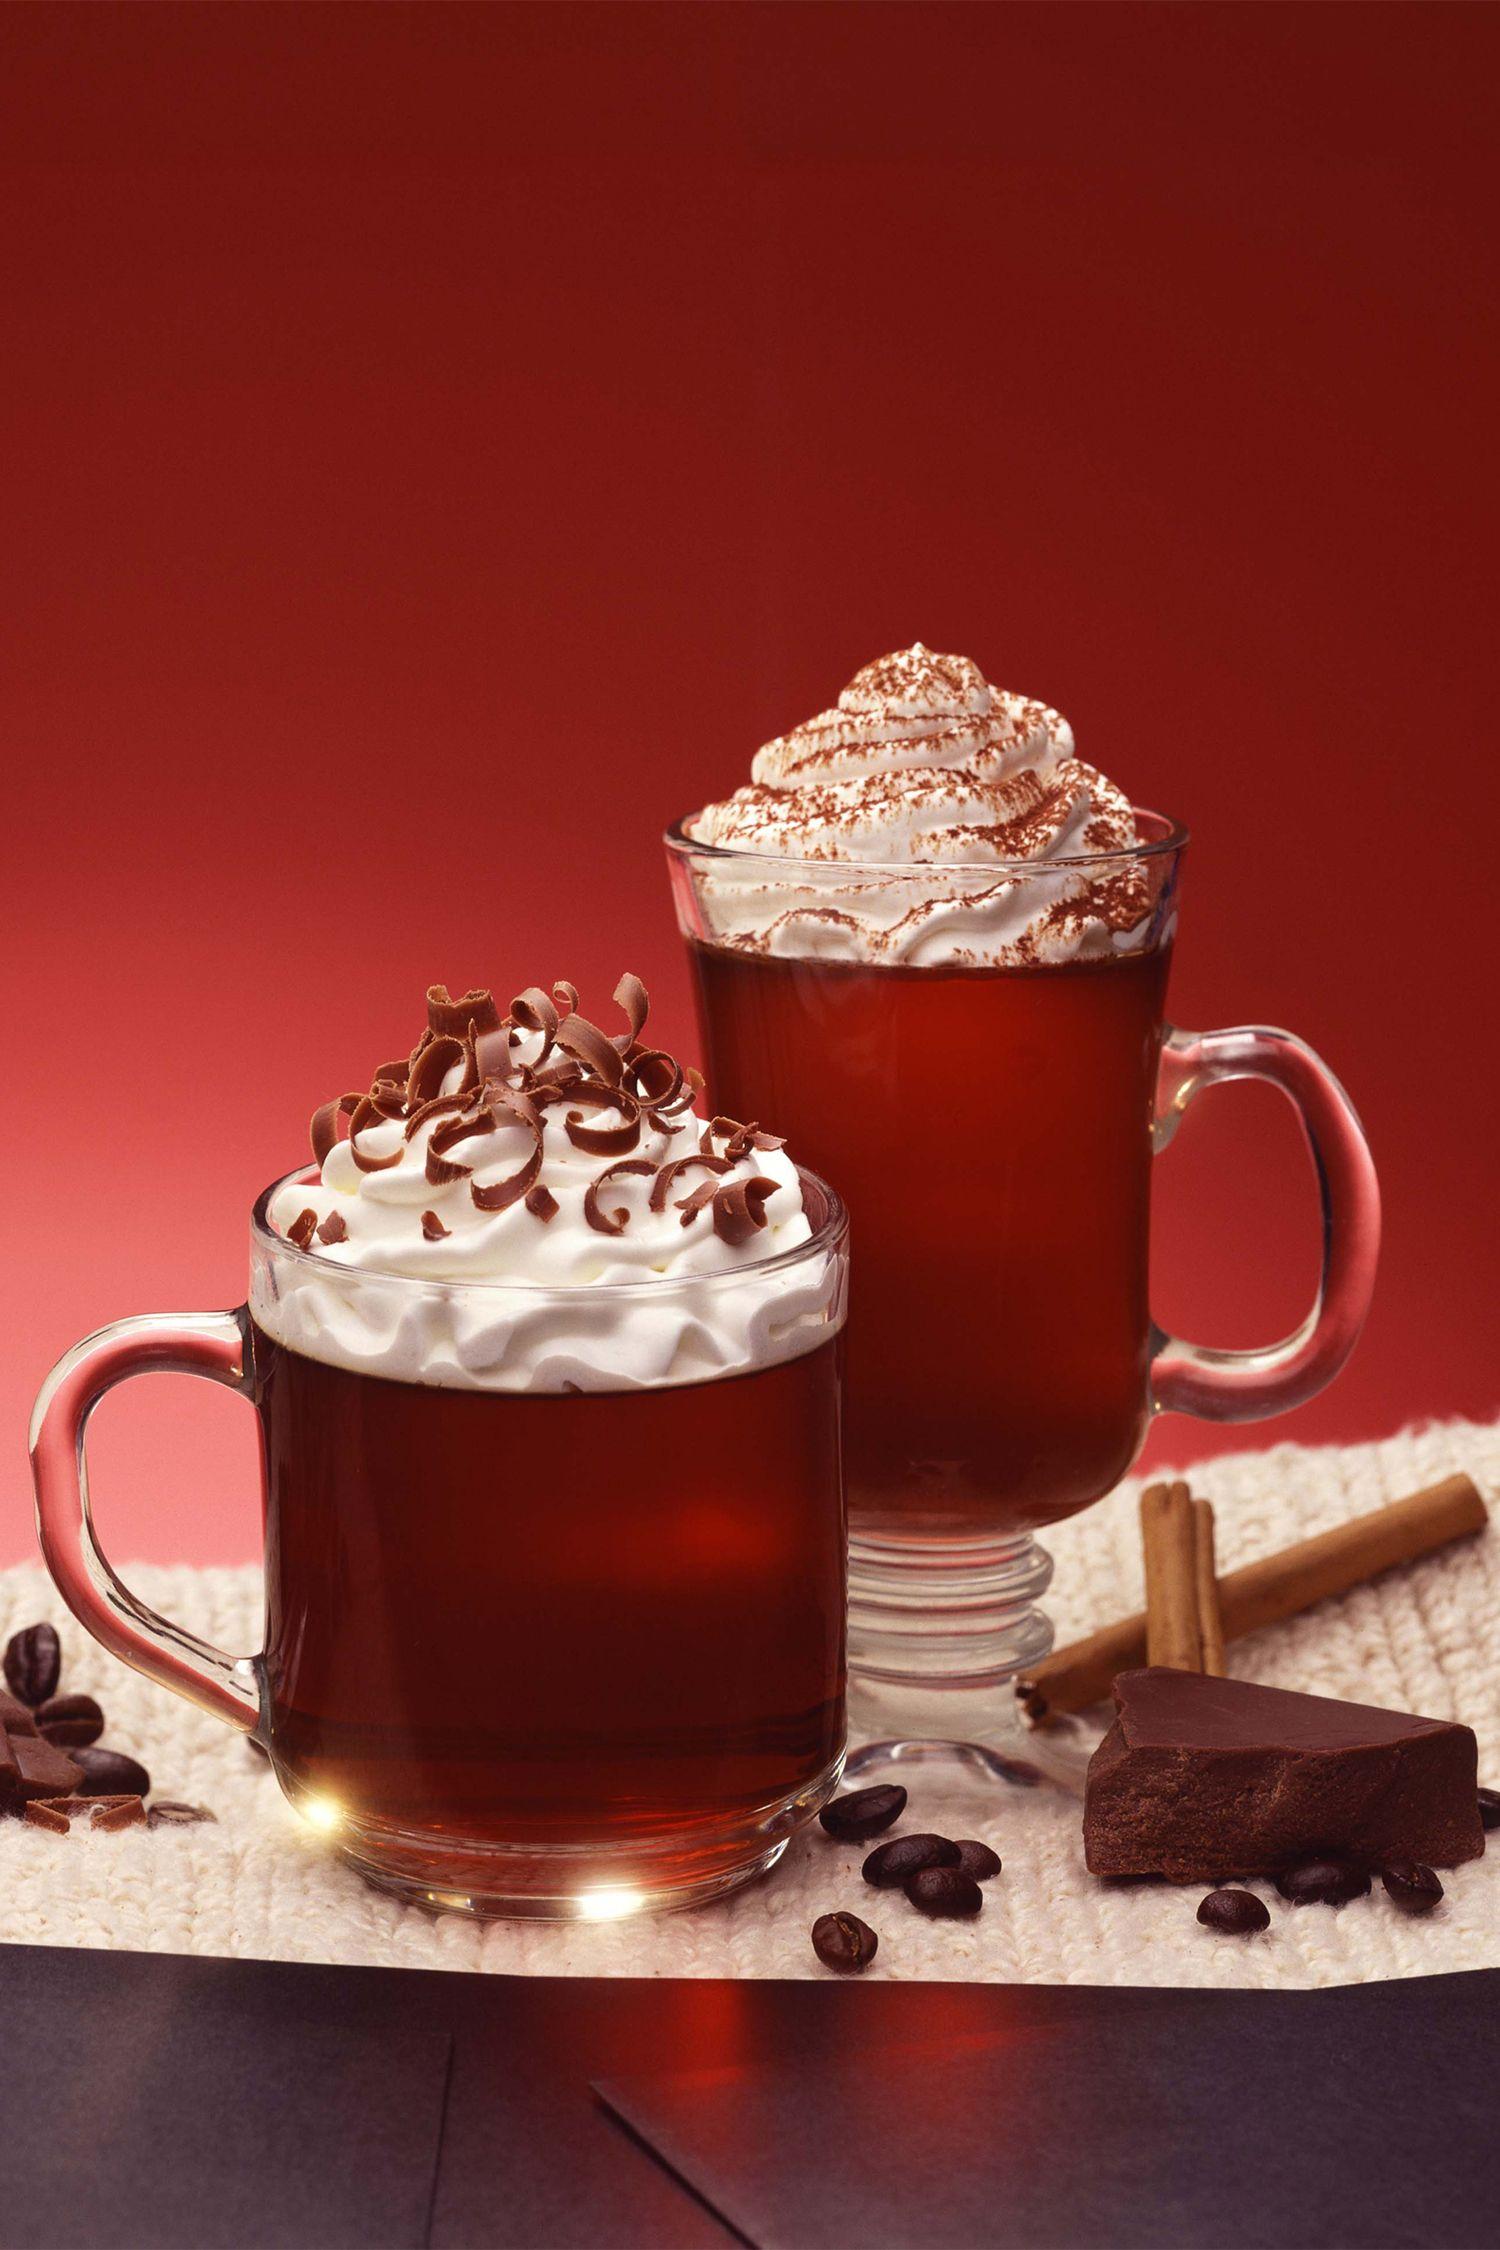 Café Amore Cocktail Recipe Coffee recipes, Hot coffee